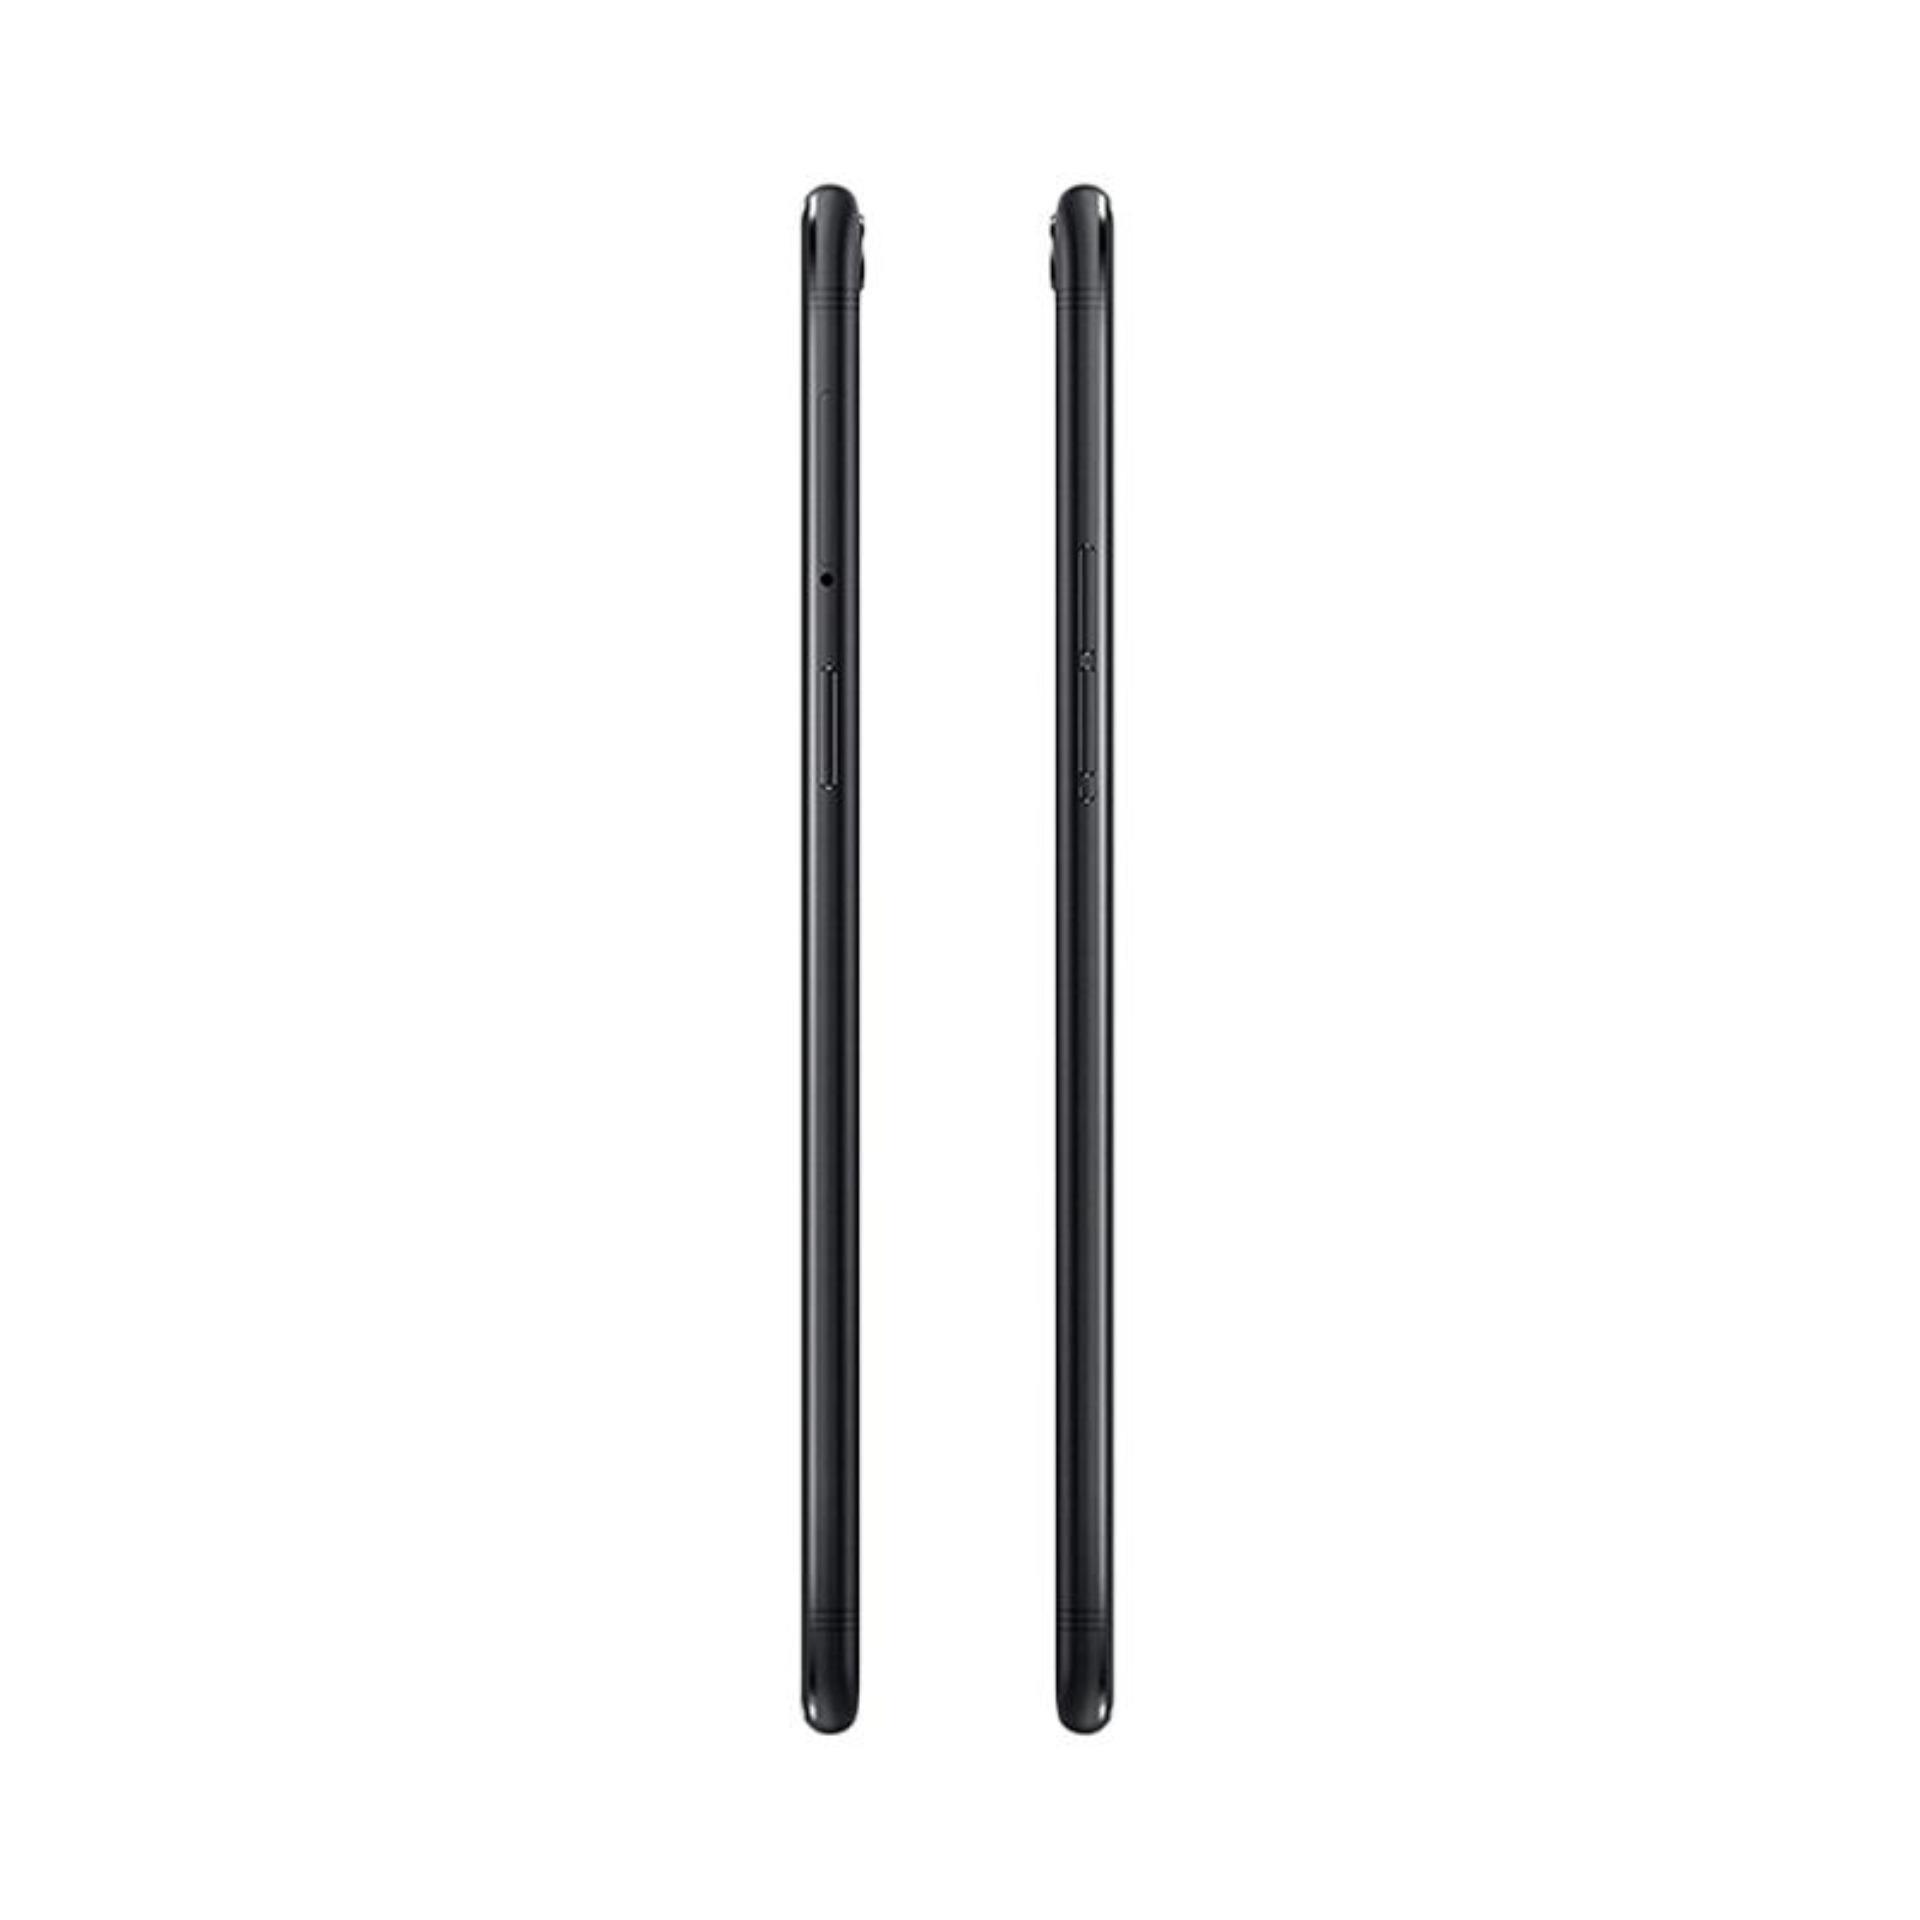 ... Oppo F3 Plus - Dual Front Camera - Layar 6 inch - Matte Black ...